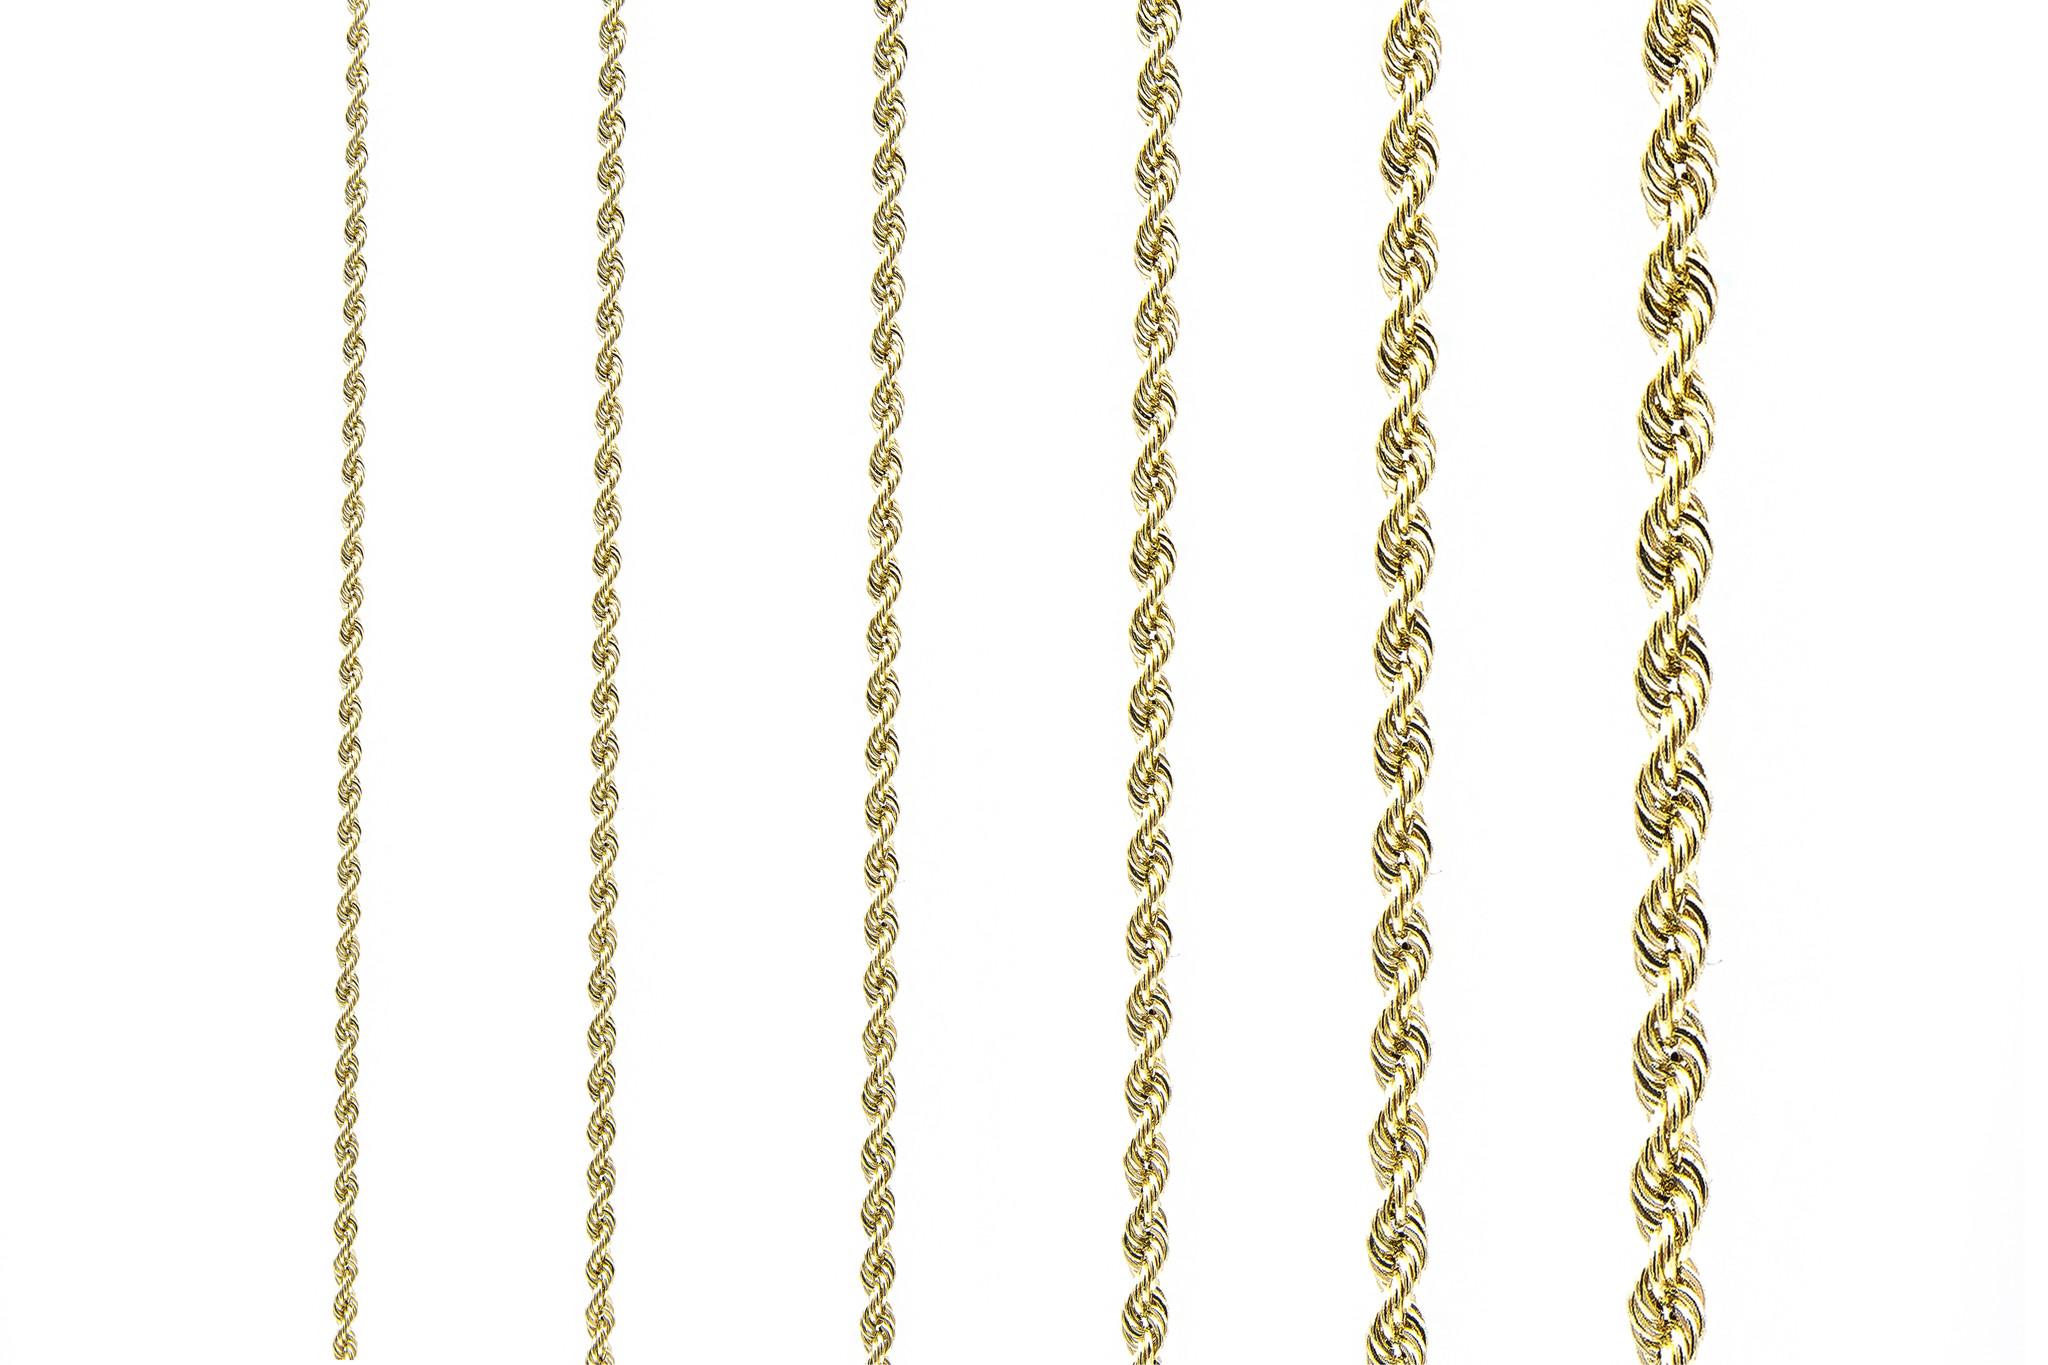 Rope chain ketting massief goud 14 kt 2.5 mm-3